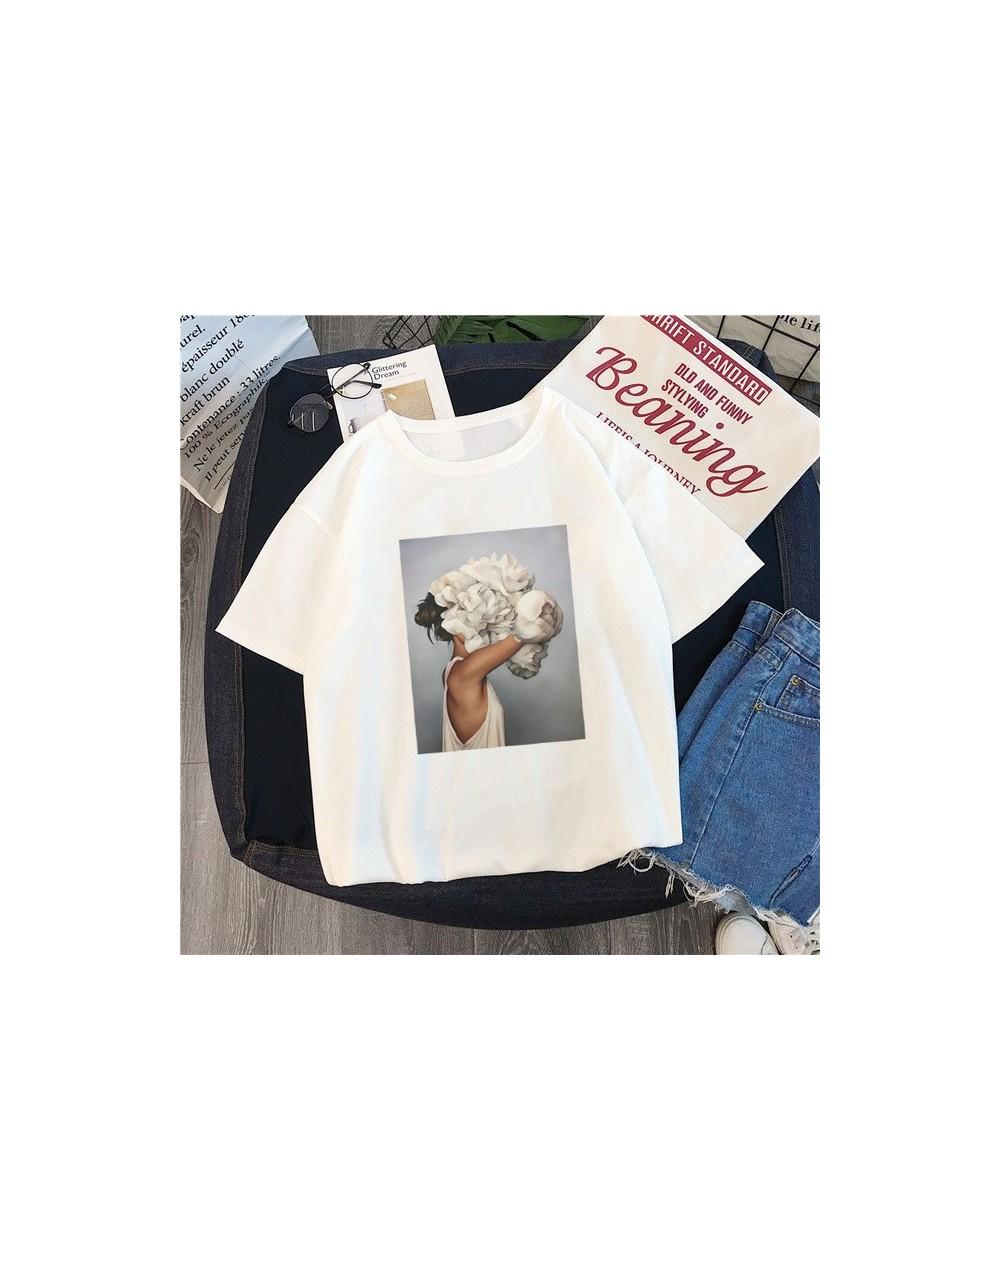 Tshirt new 2019 tshirt round neck short sleeve casual loose Europe and America flowers print short-sleeve women's T-shirt TX...